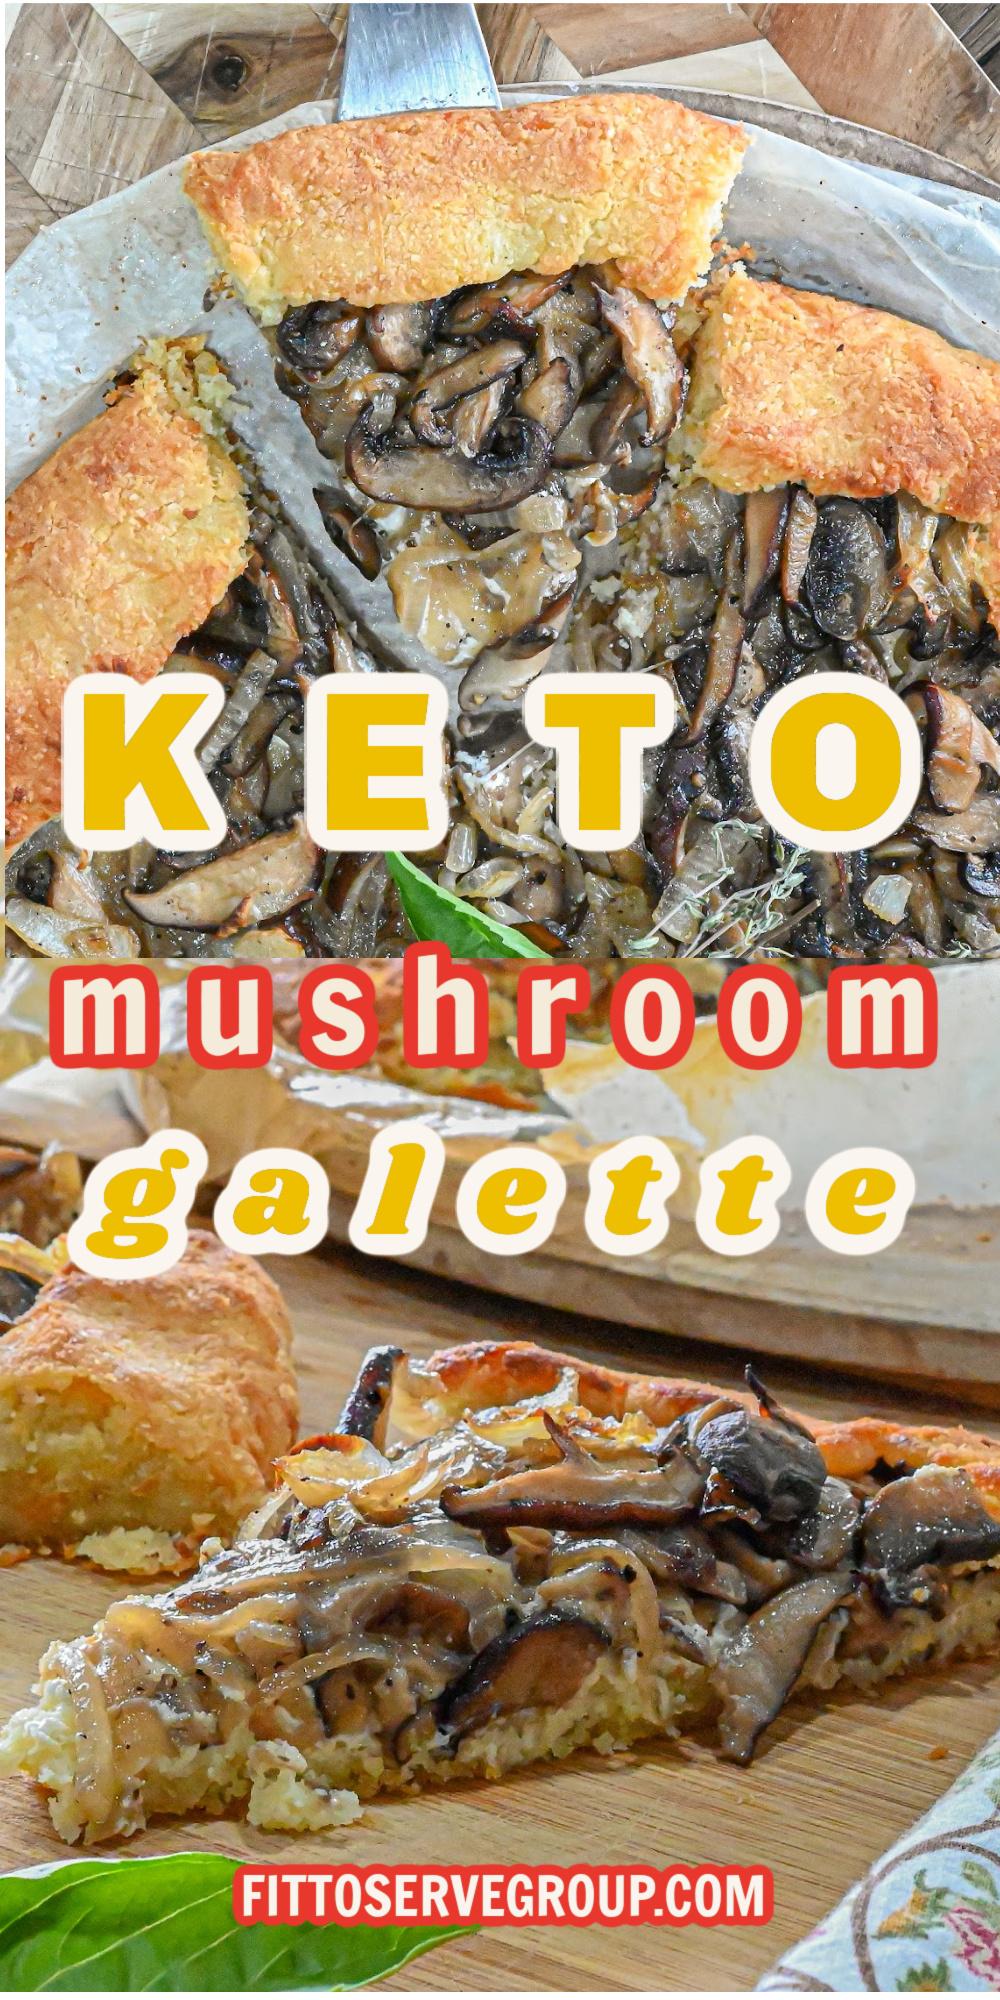 Keto Mushroom Galette